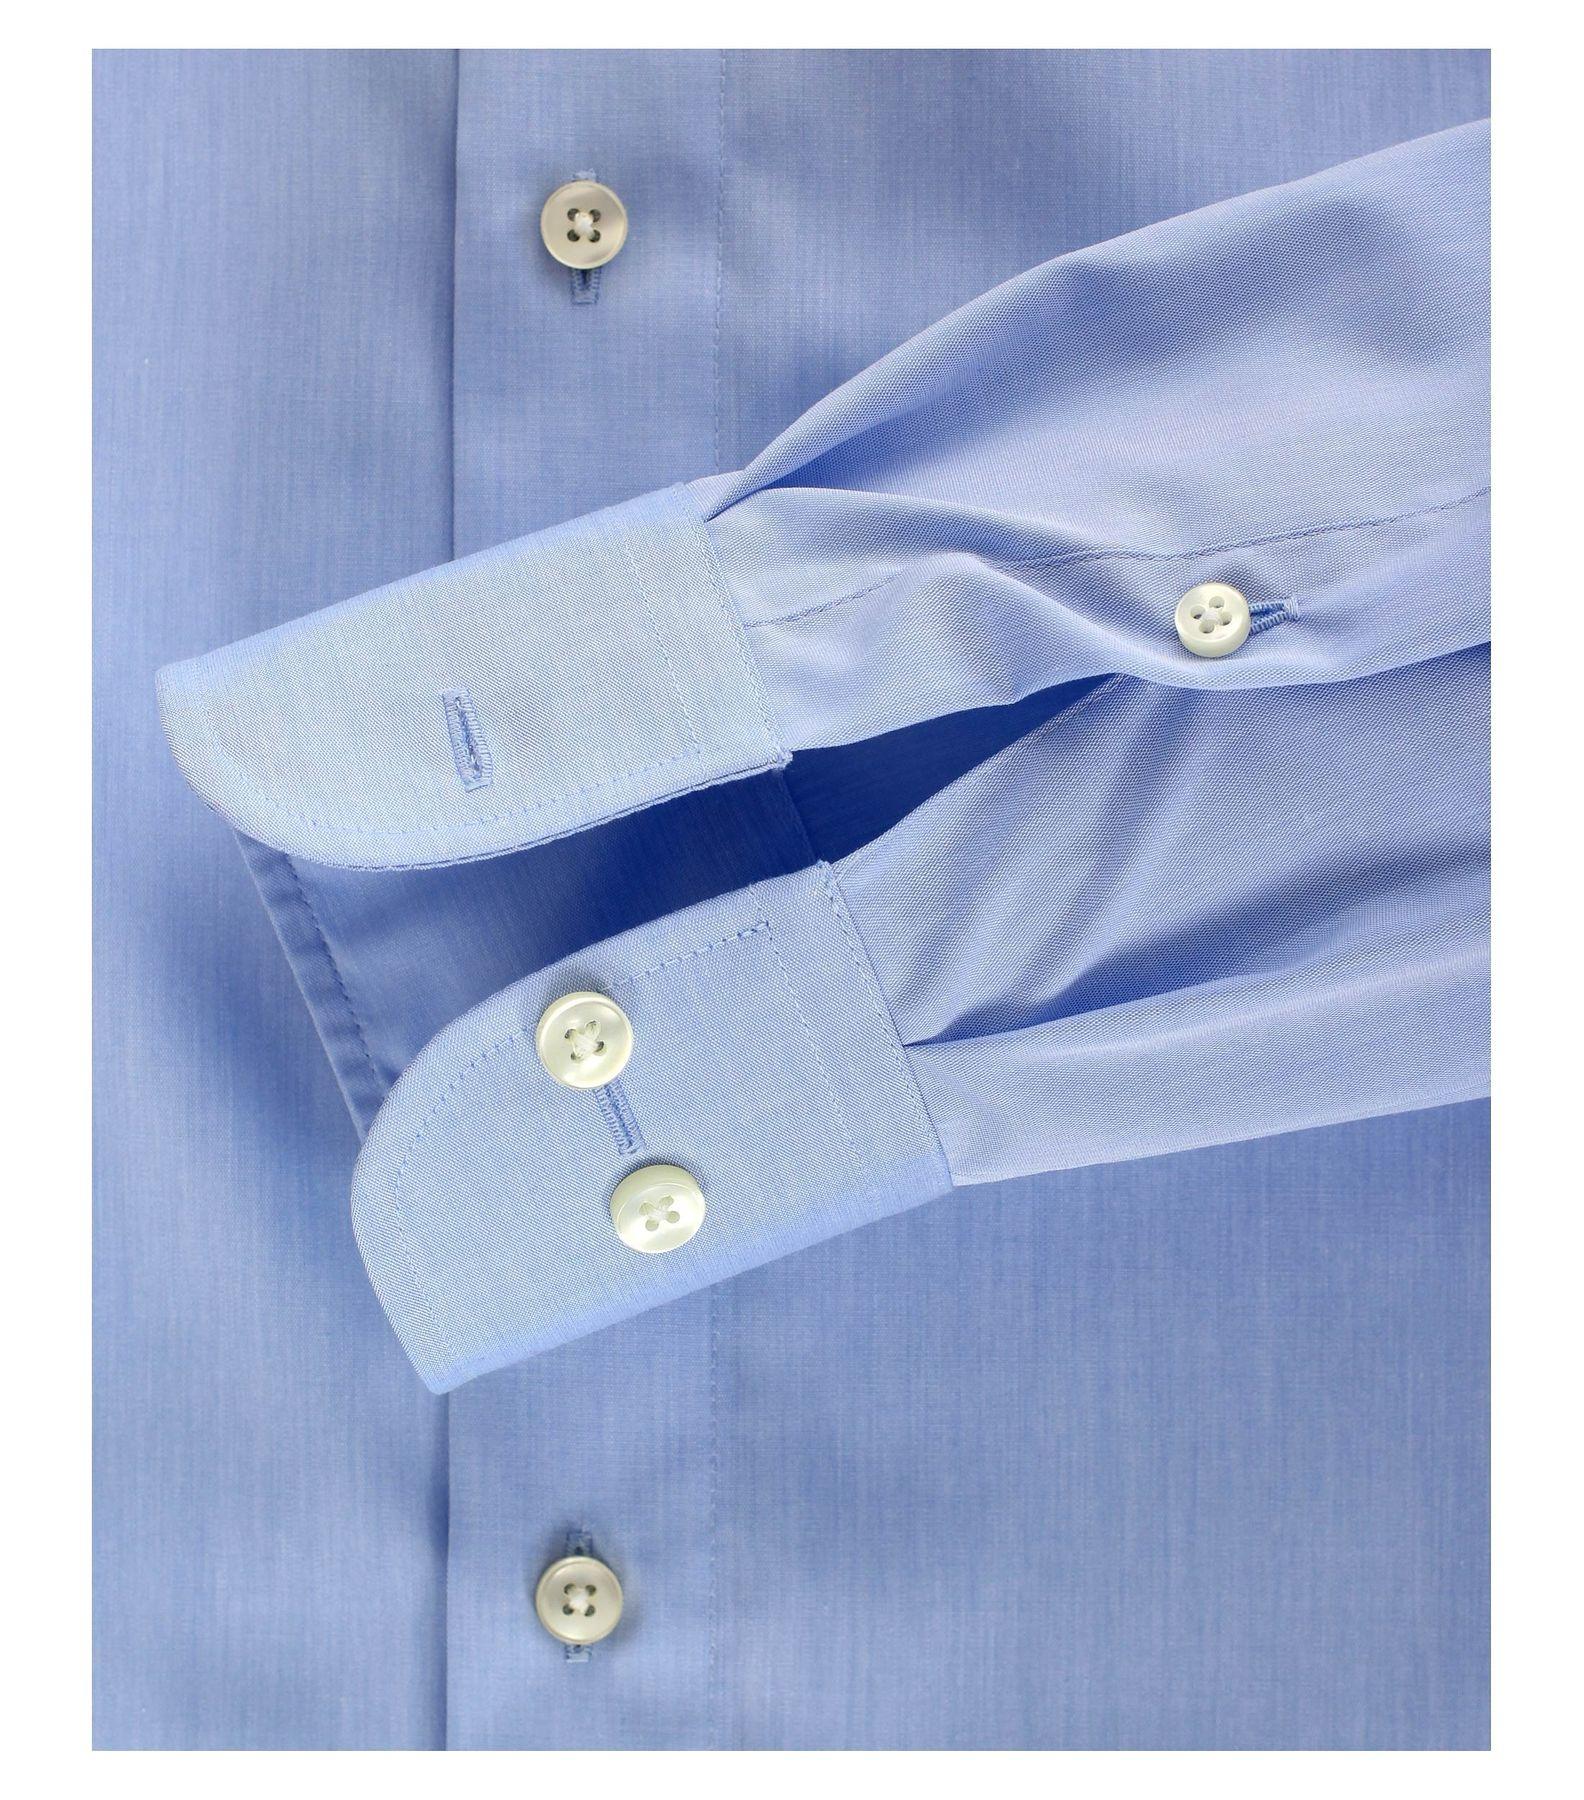 Casa Moda - Comfort Fit - Bügelfreies Herren Business Langarm Hemd verschiedene Farben (006060A) – Bild 8